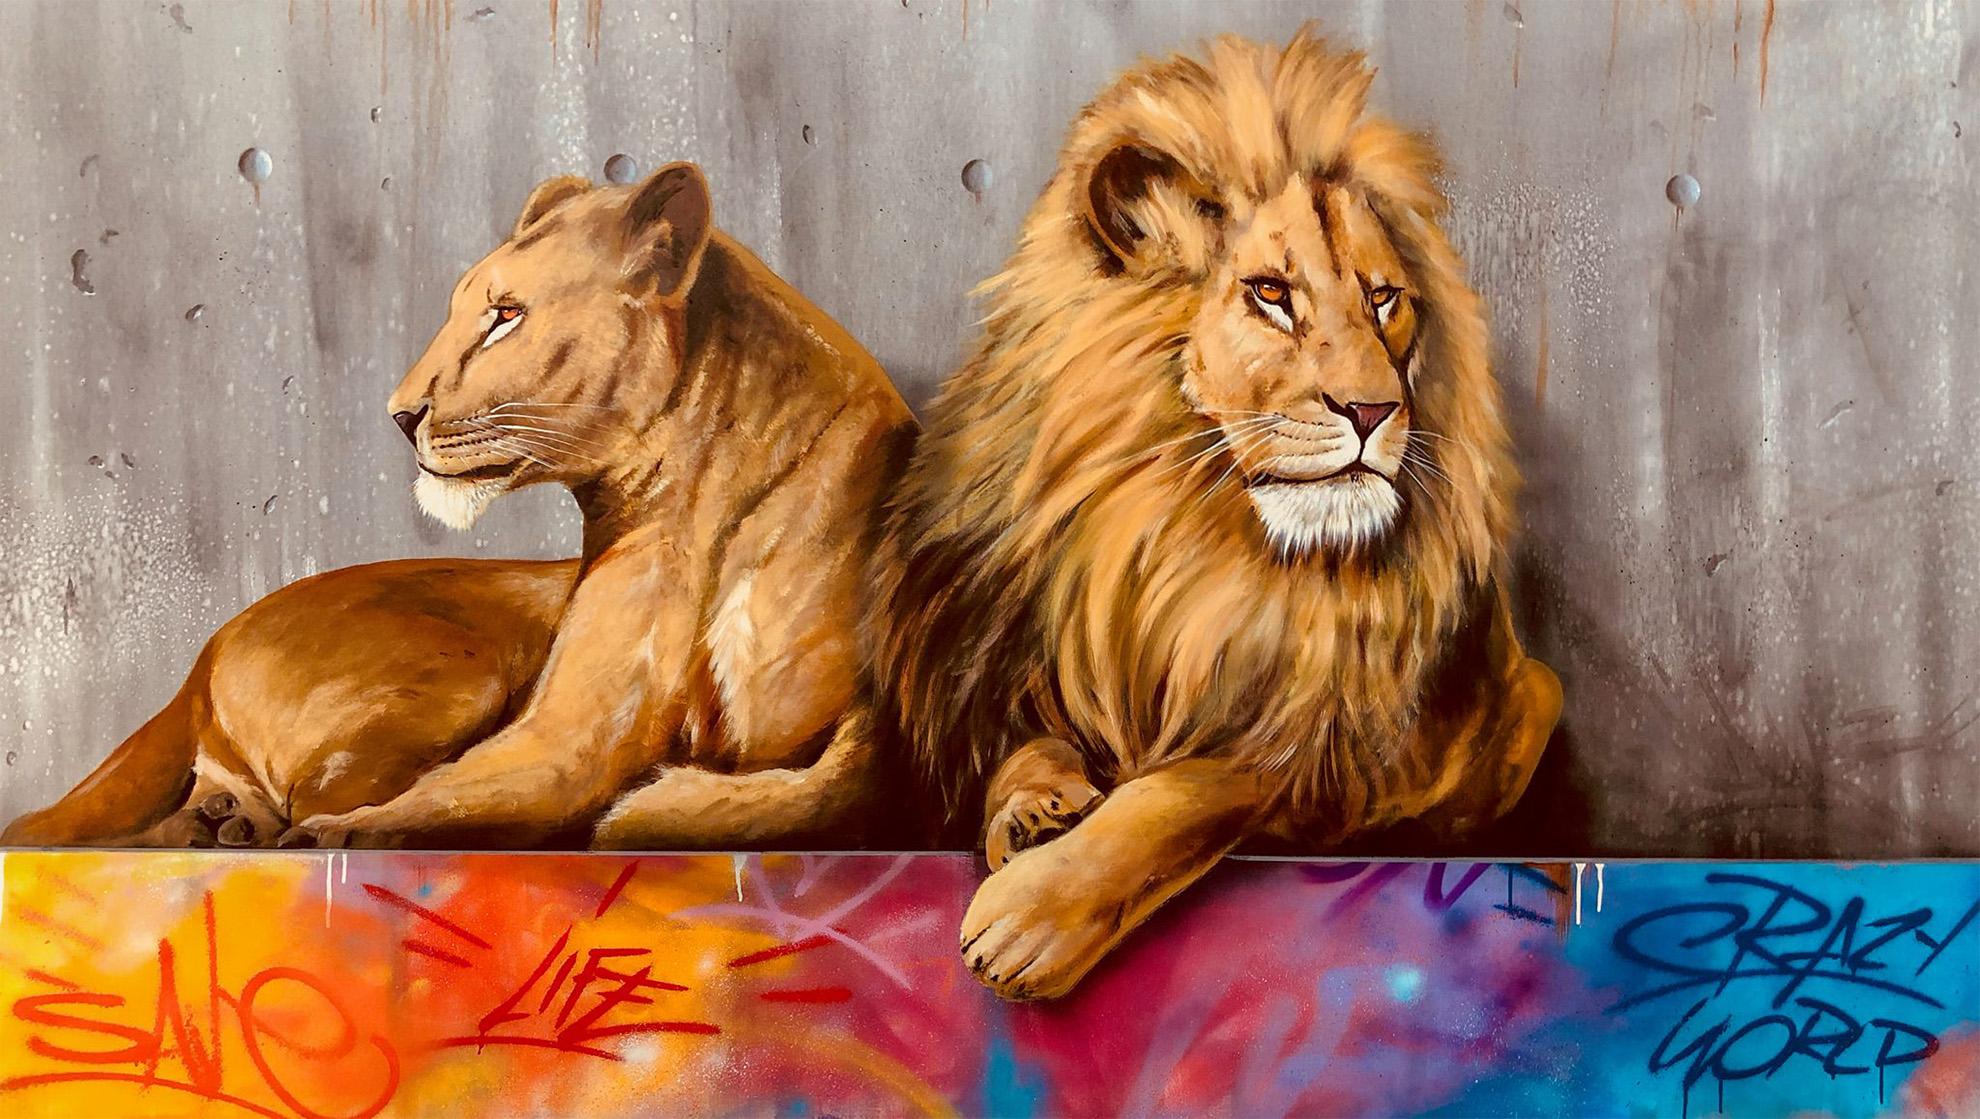 dave baranes artiste peintre peintre mural animalier marvel dc comics h bra que art fresque. Black Bedroom Furniture Sets. Home Design Ideas